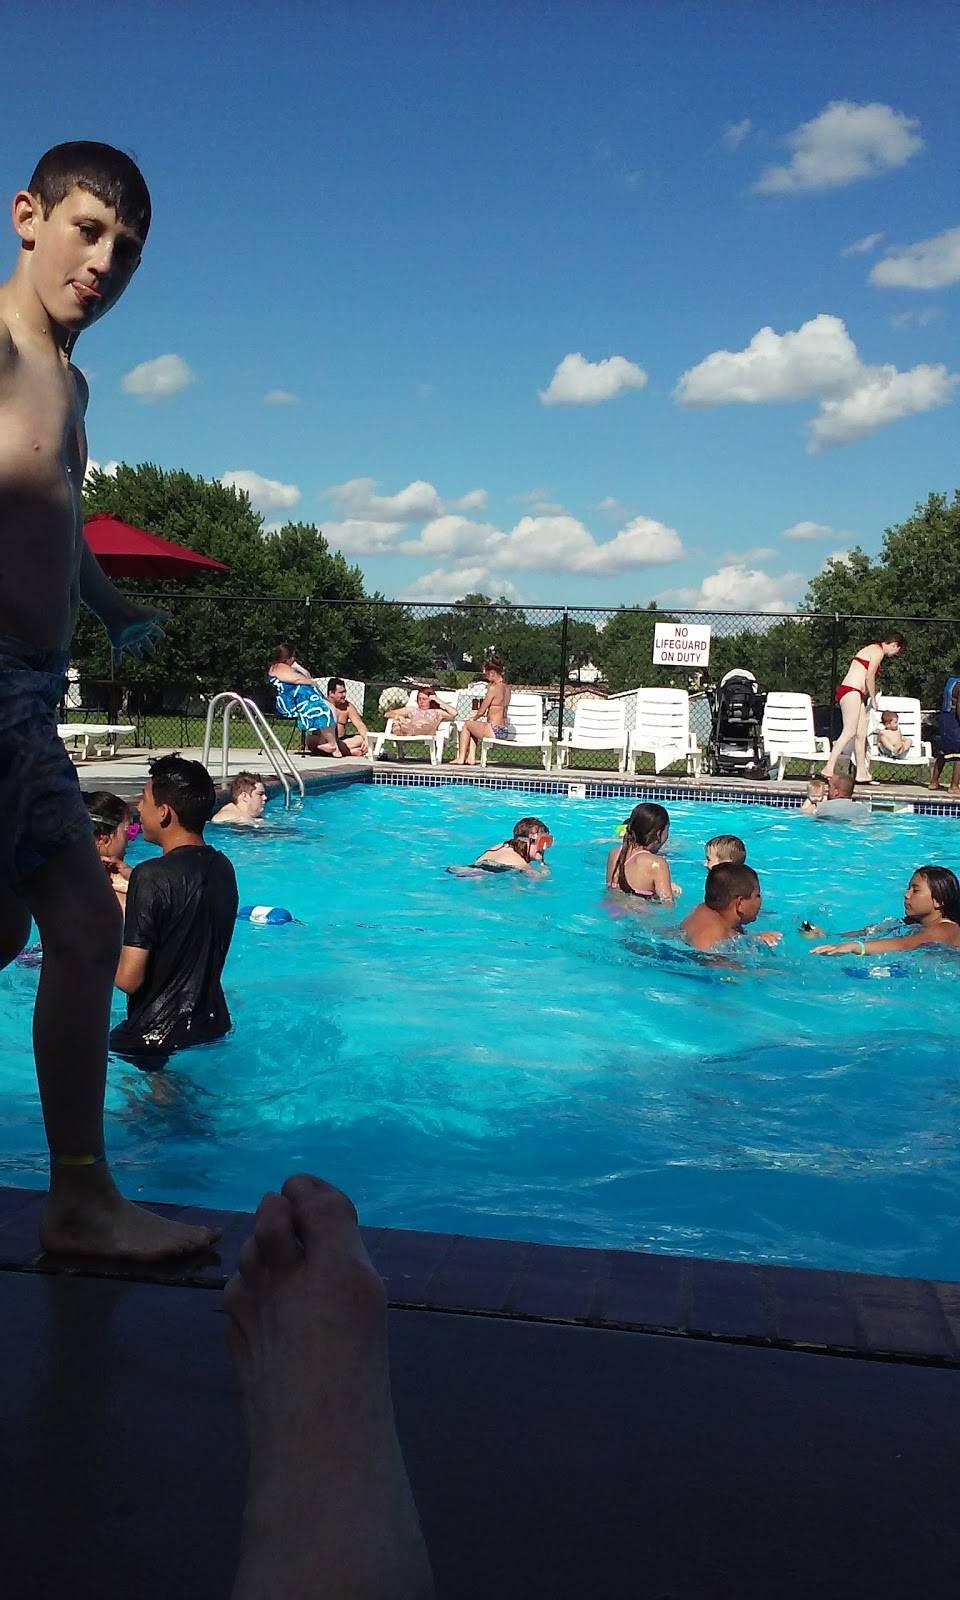 Heritage Oaks Mobile Home Park - rv park  | Photo 2 of 10 | Address: 2720 N 2nd St, Lincoln, NE 68521, USA | Phone: (402) 475-5572